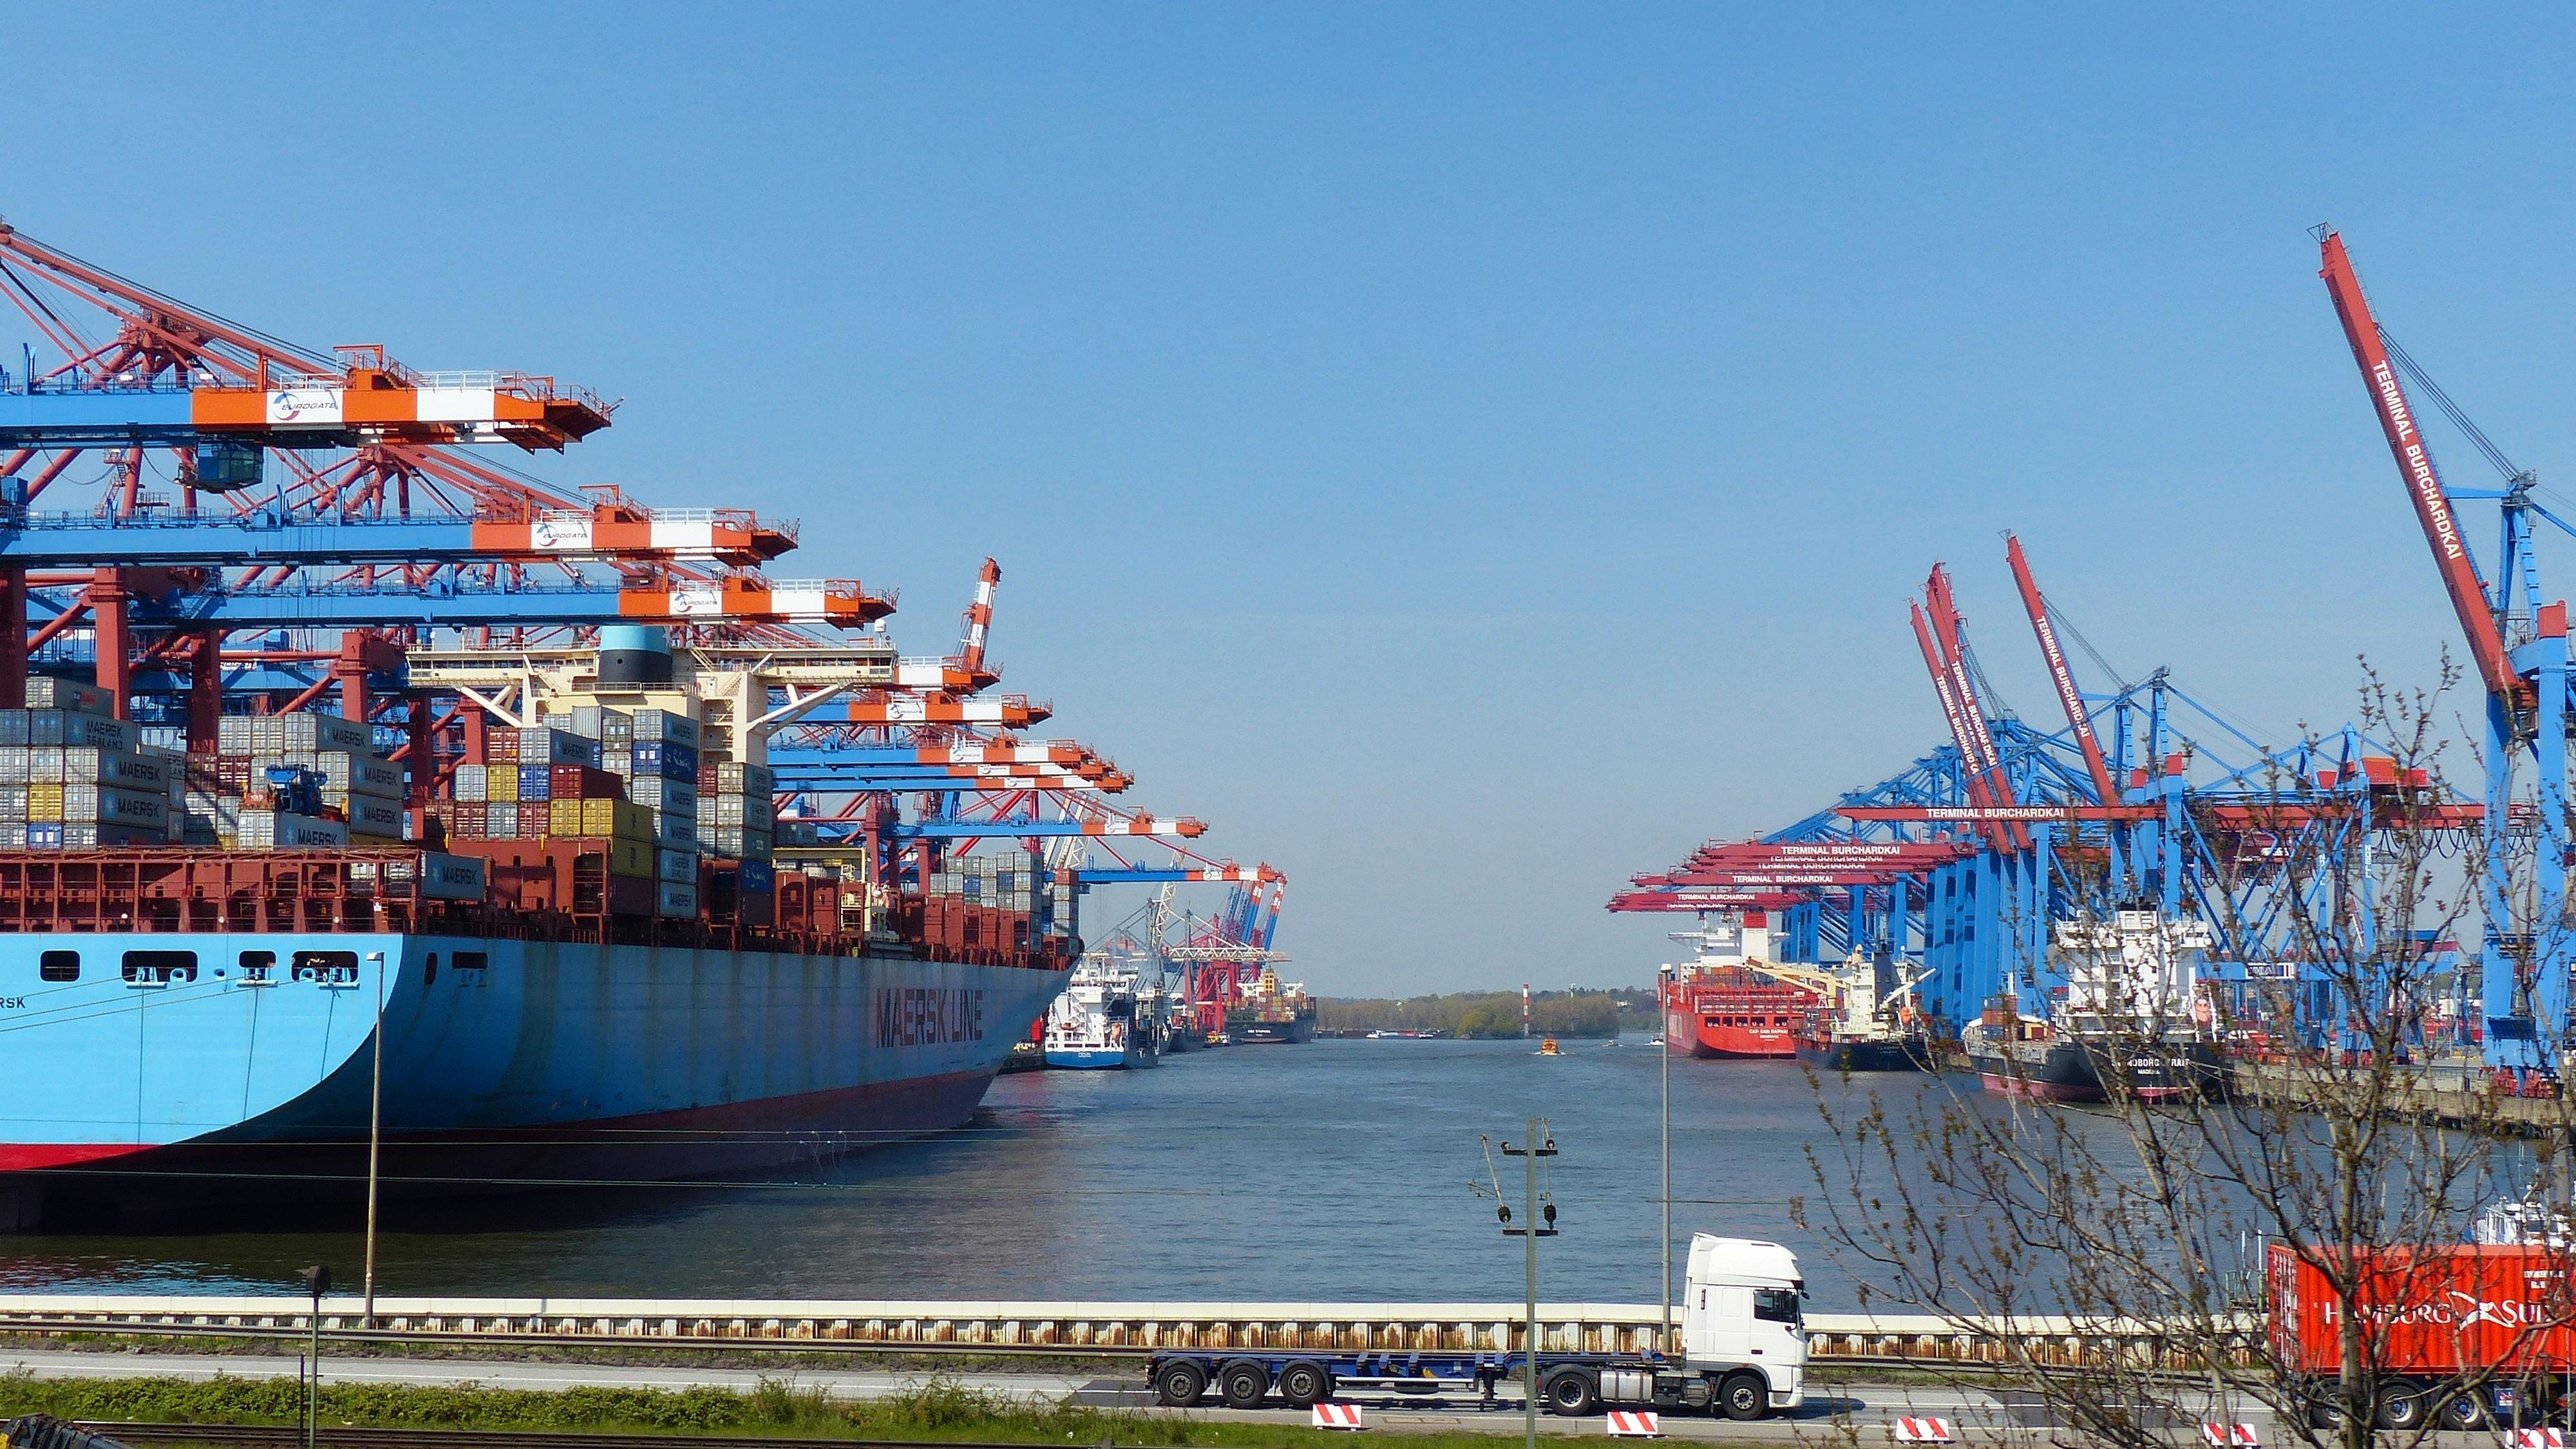 Harbor Freight Gantry Crane >> Free Images : sea, water, vehicle, harbor, waterway ...